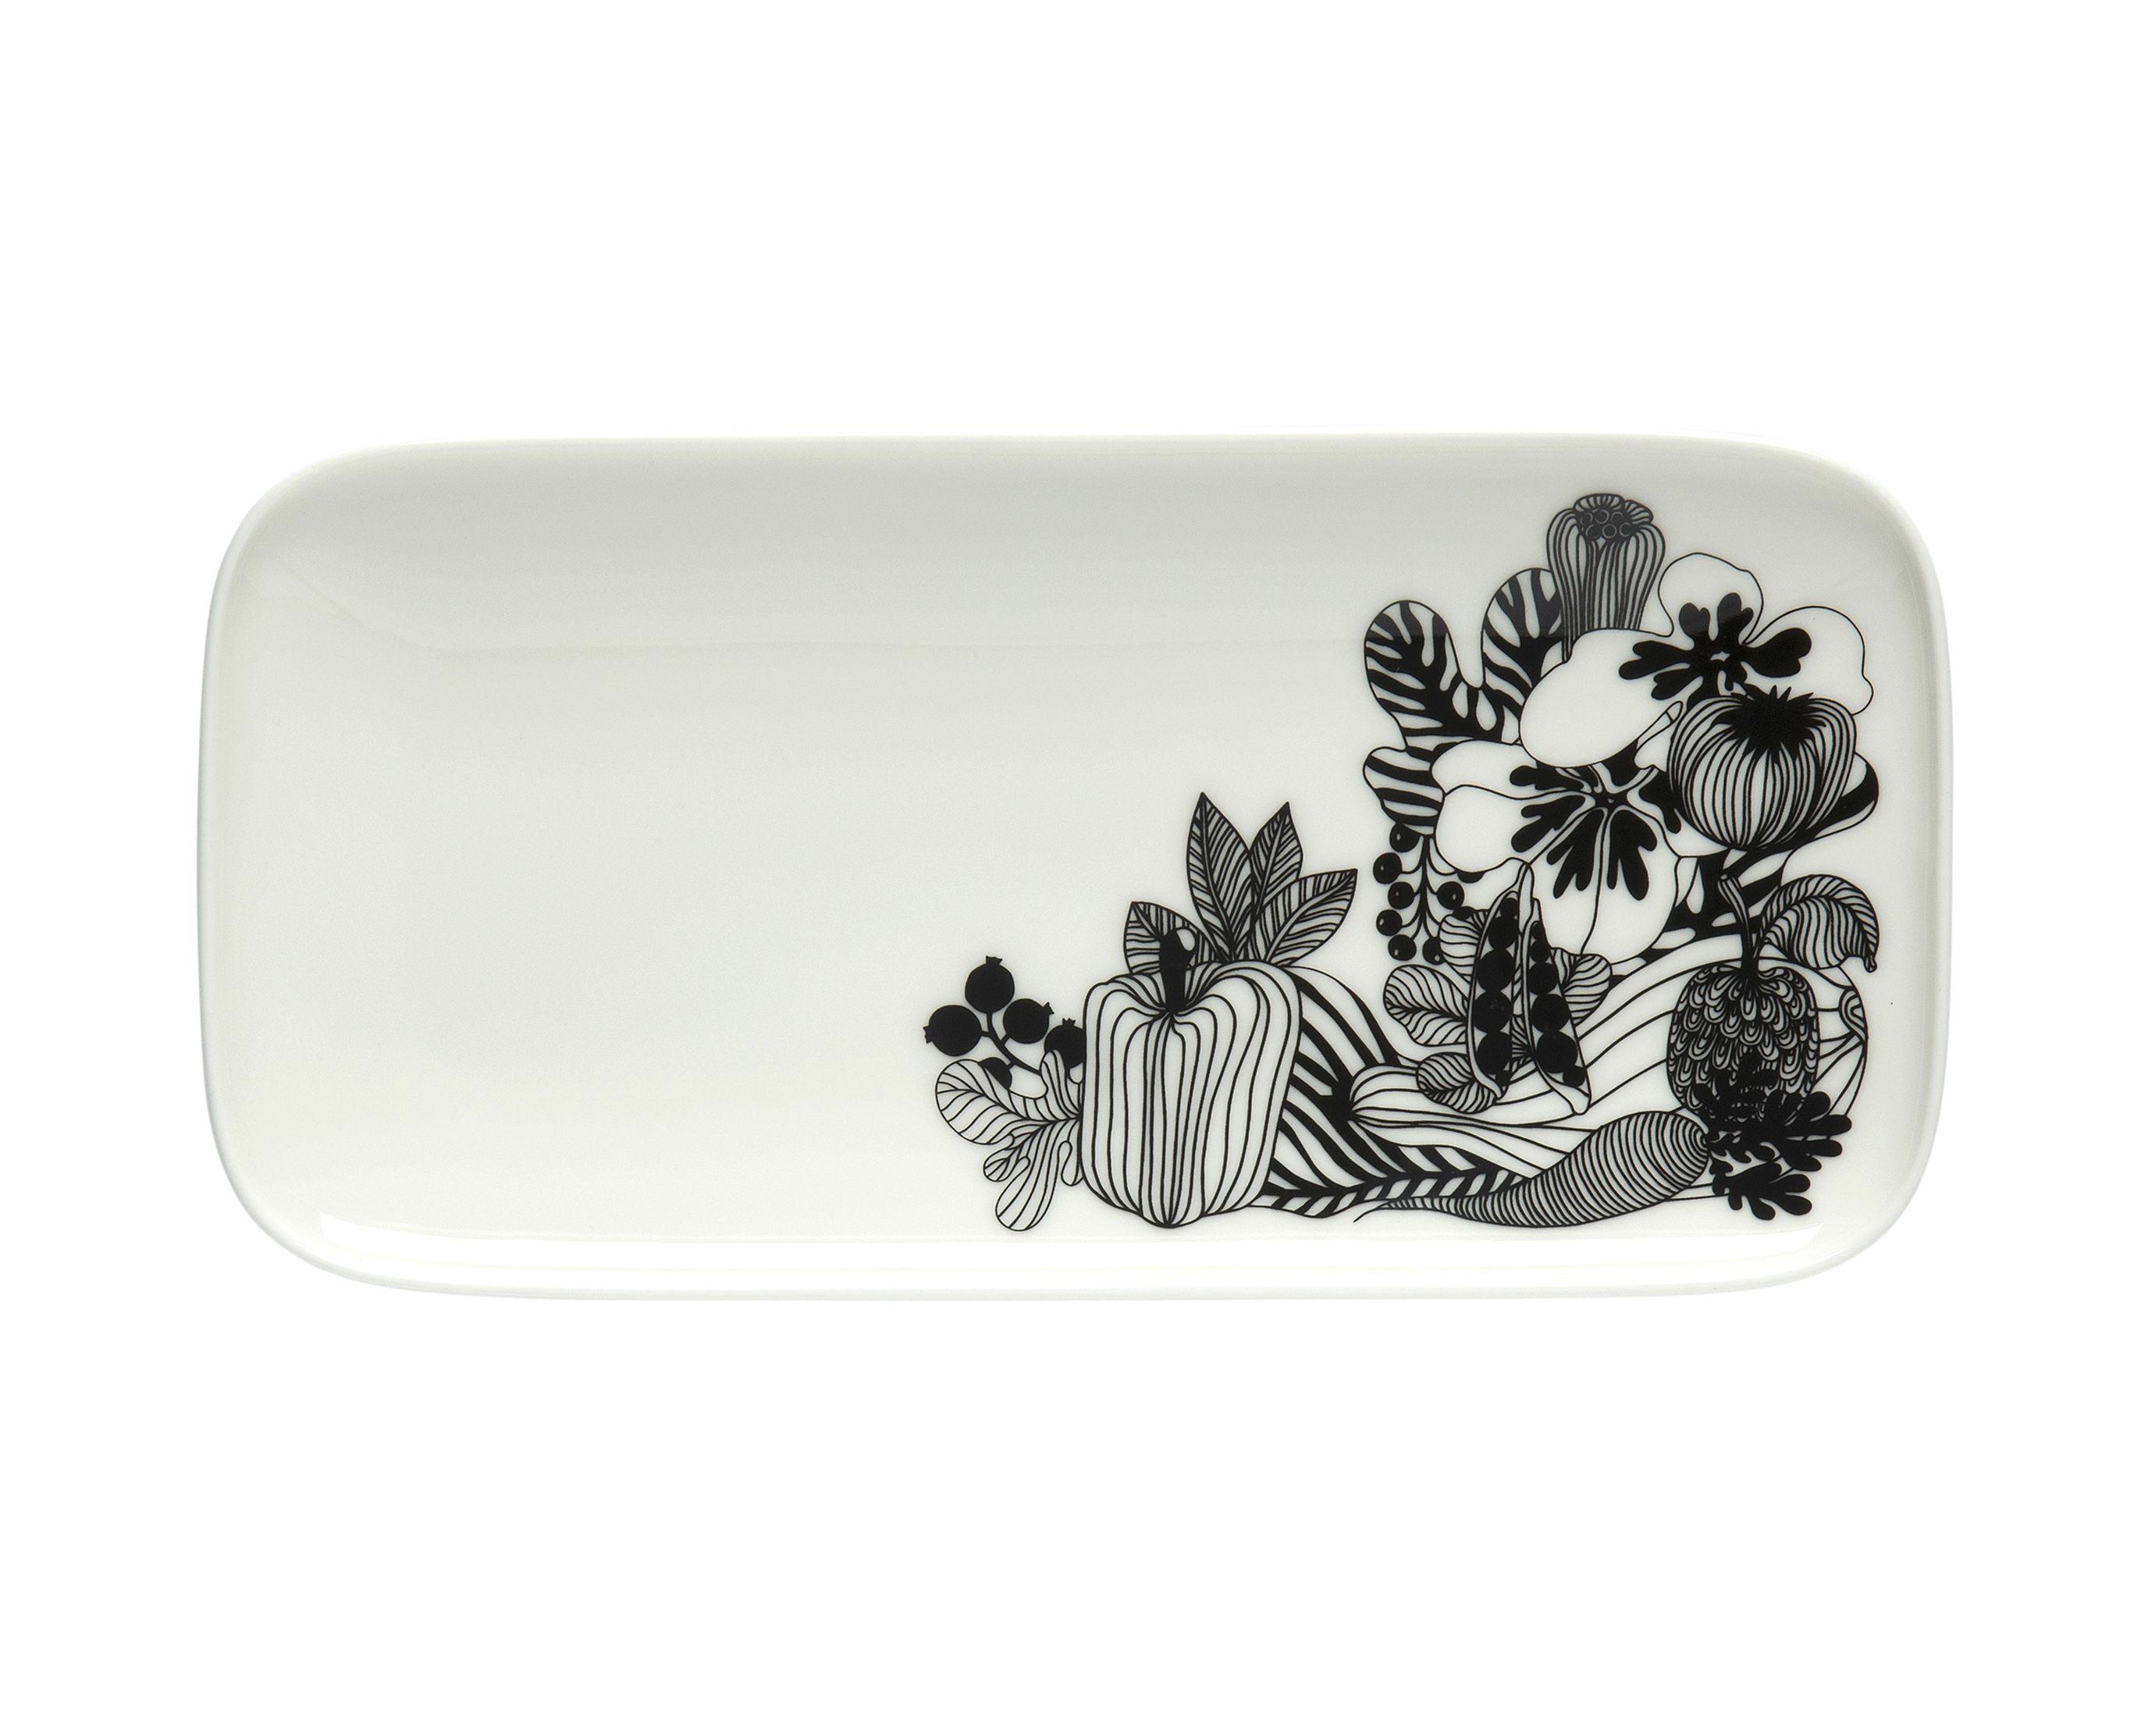 Arts de la table - Assiettes - Assiette Siirtolapuutarha / 12 x 24,5 cm - Marimekko - Siirtolapuutarha / Noir & blanc - Grès